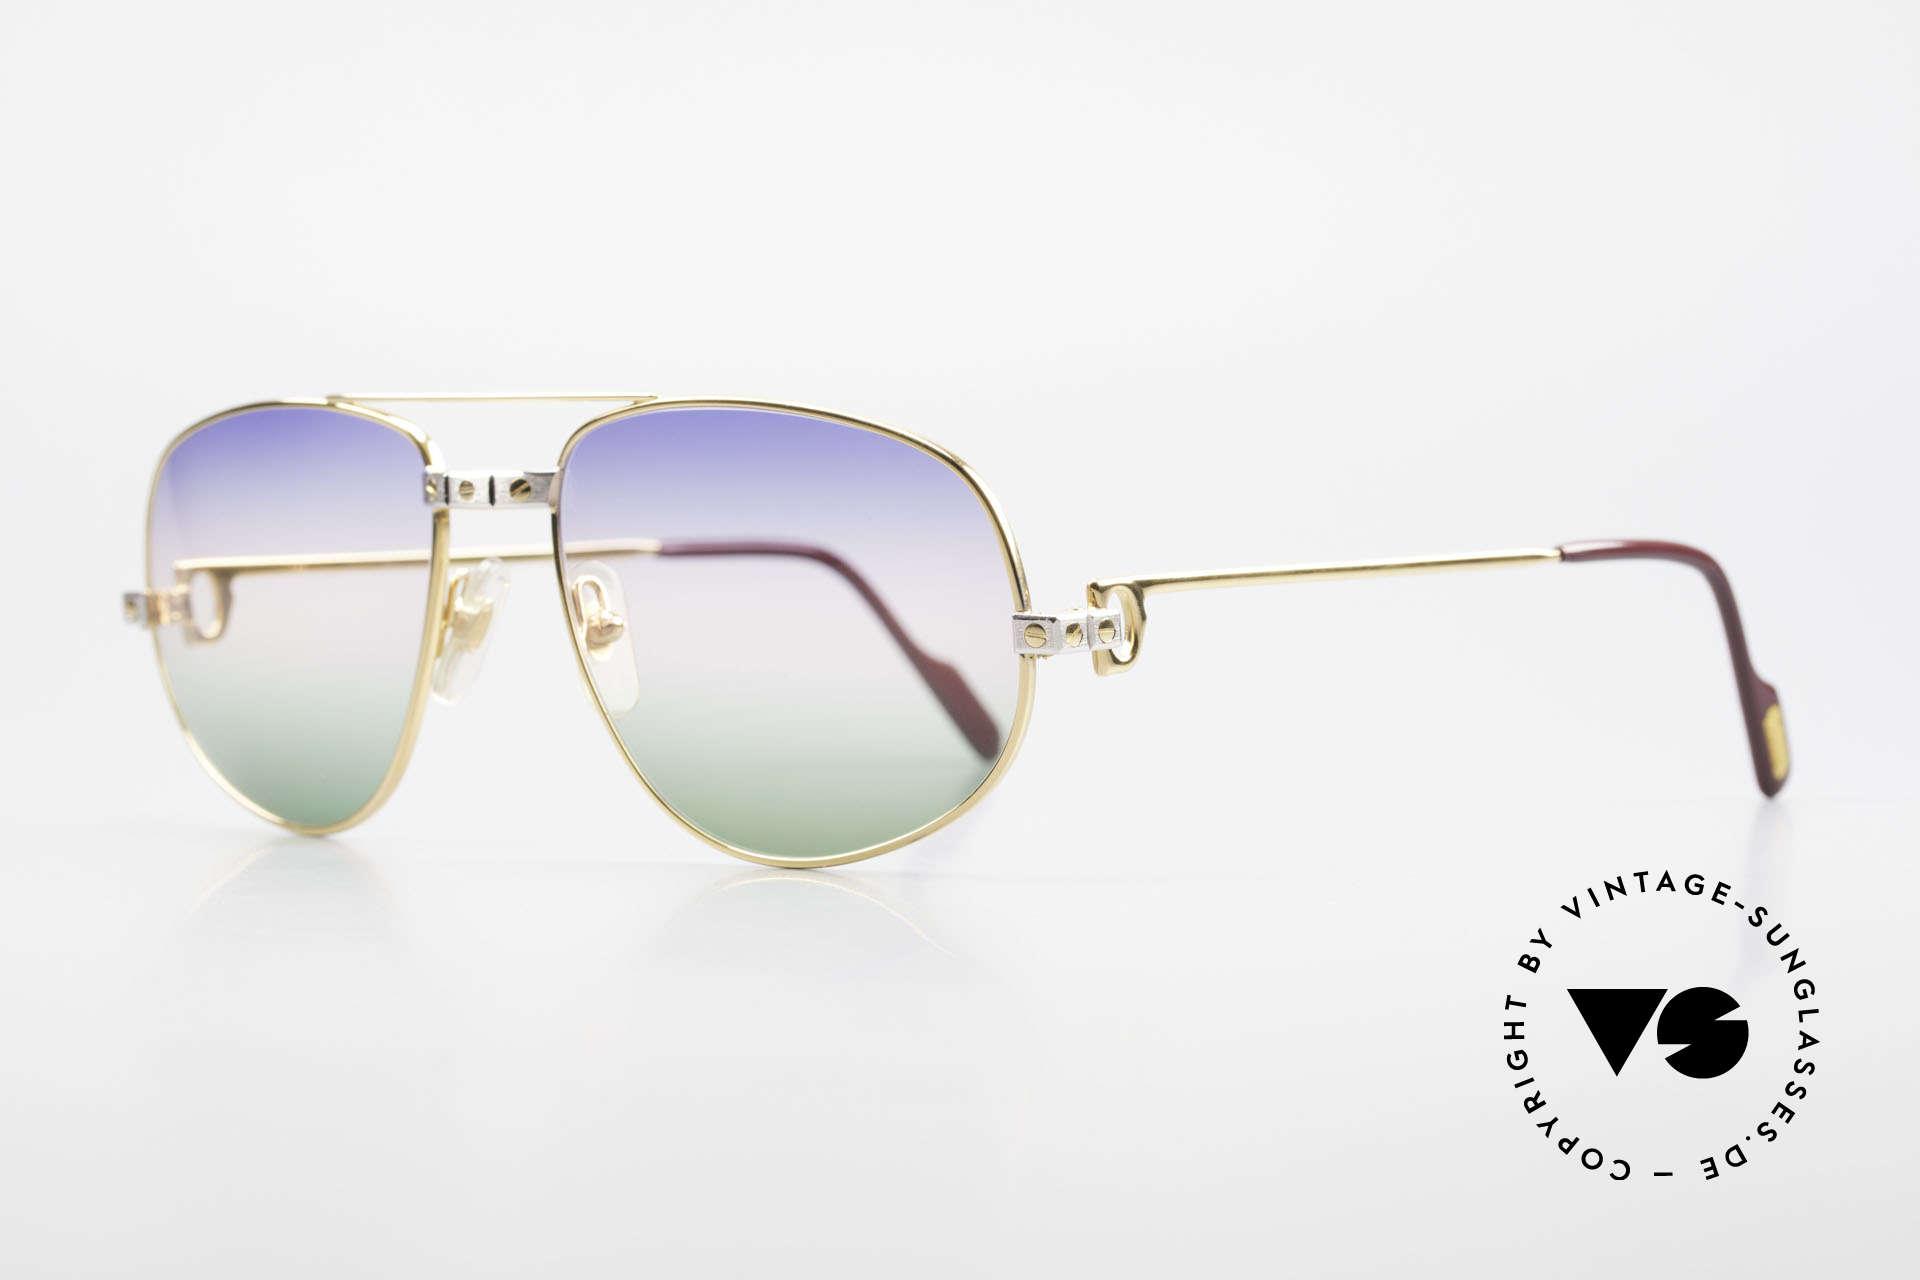 Cartier Romance Santos - L 80s Luxury Vintage Sunglasses, this pair (with SANTOS decor) is LARGE size 58-18, 140, Made for Men